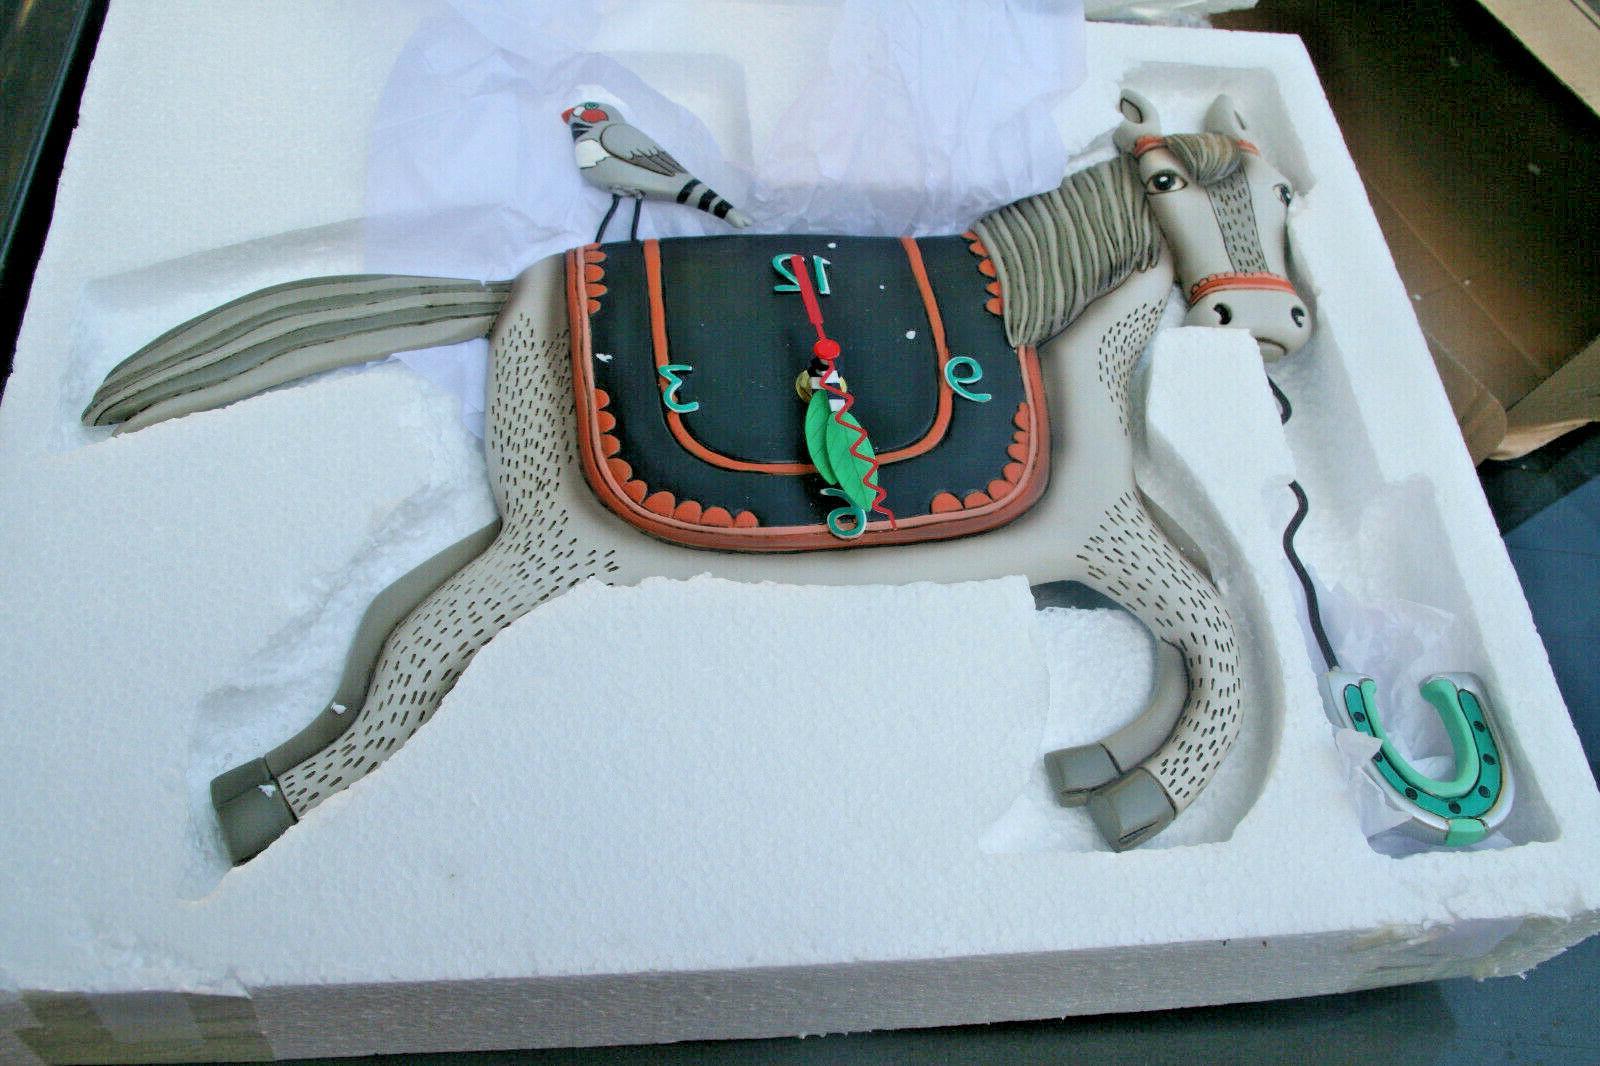 woah horsey horse pendulum childs kids whimsical